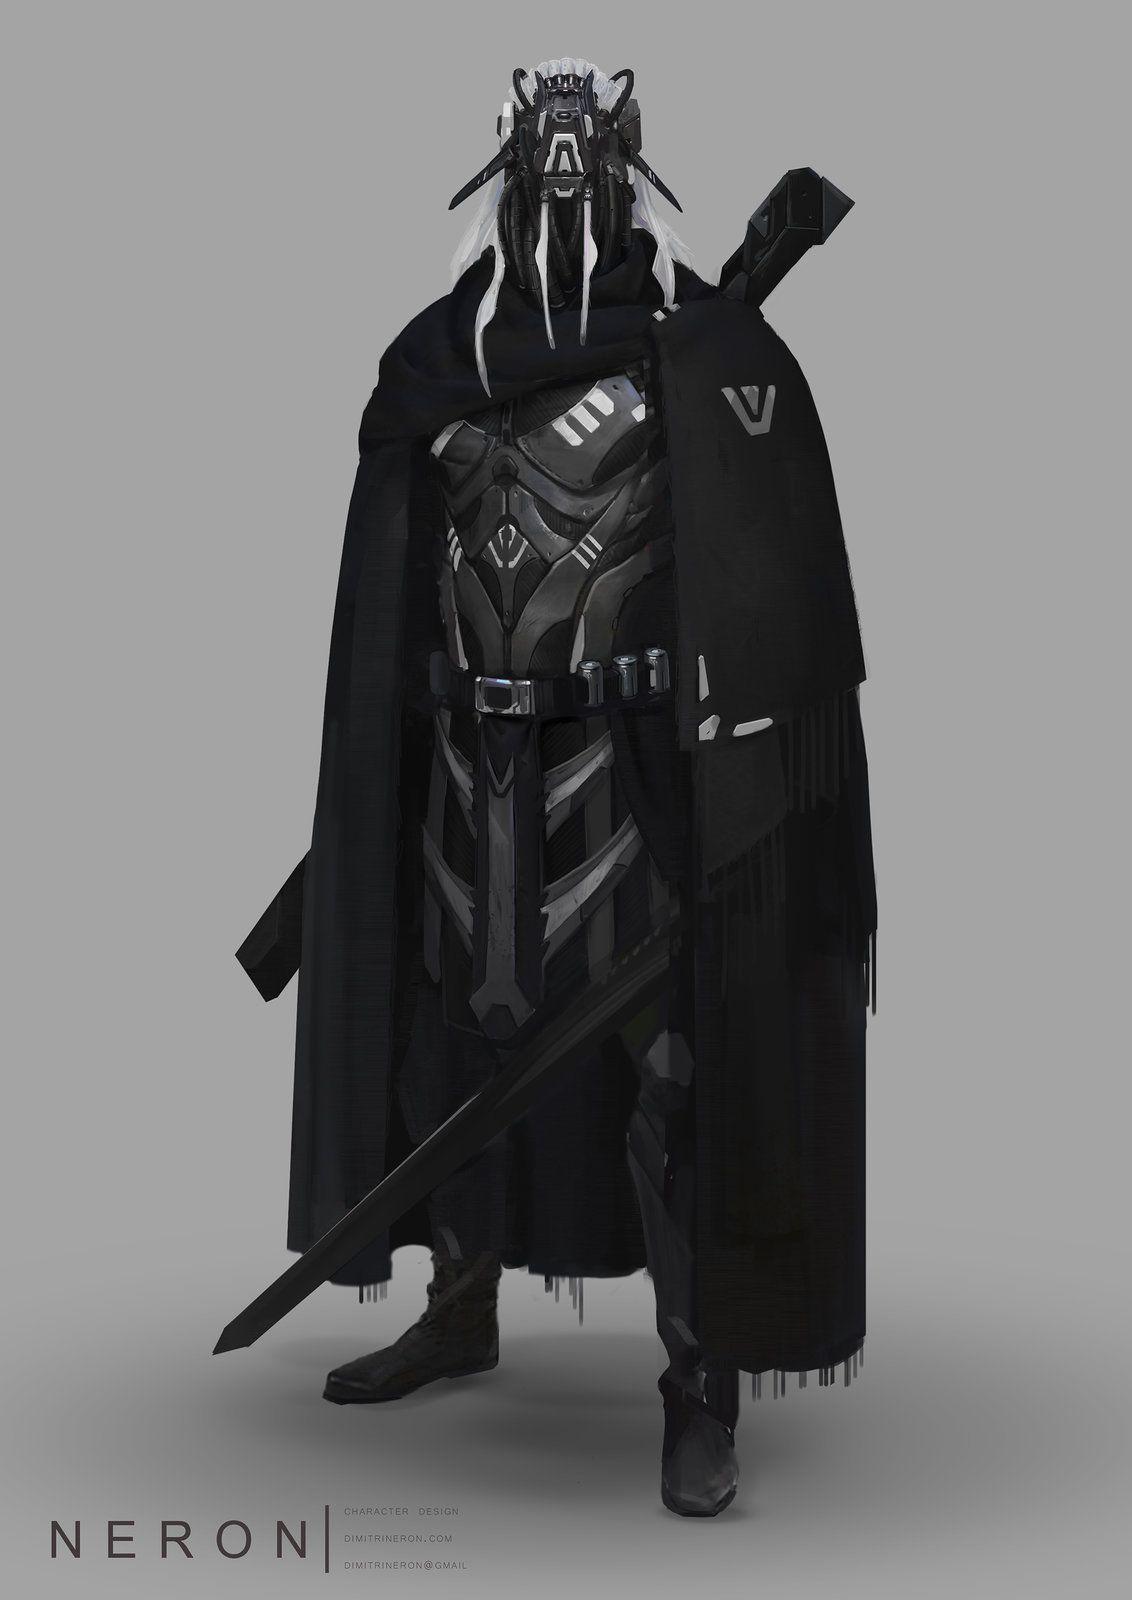 D-Victk, Dimitri Neron on ArtStation at https://www.artstation.com/artwork/o2ynO